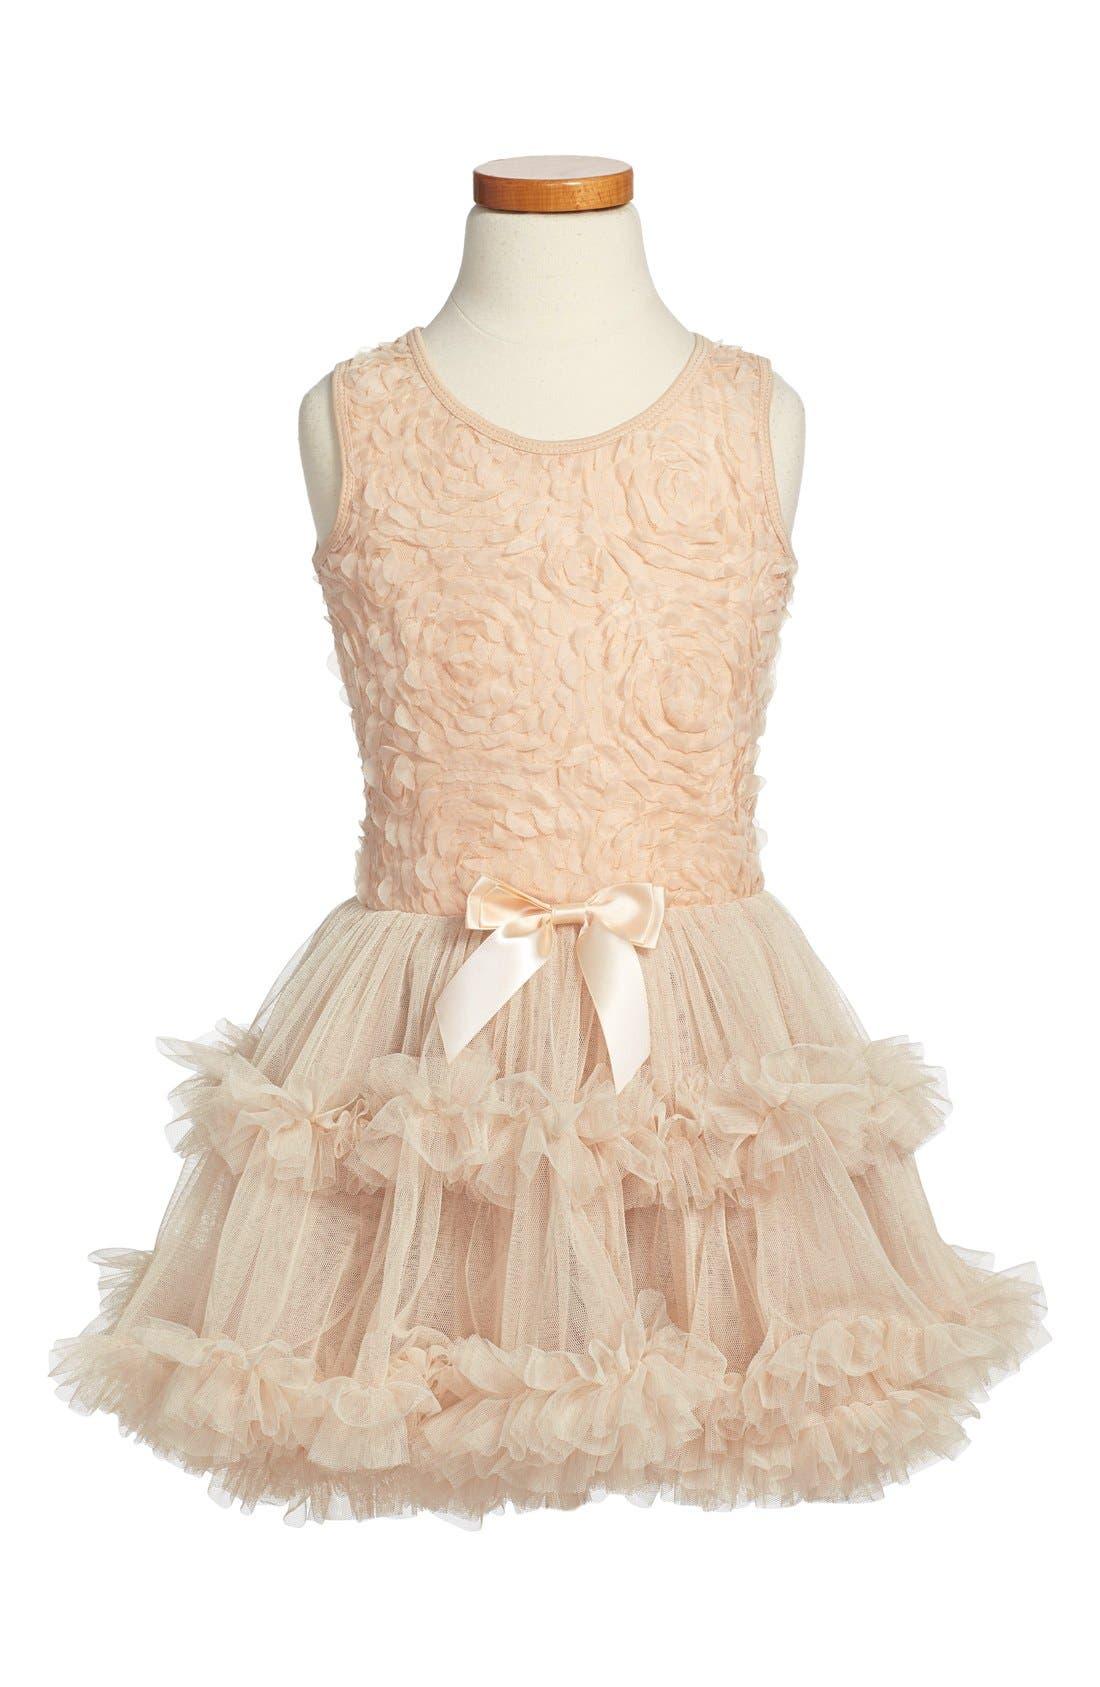 Main Image - Popatu Ribbon Rosette Sleeveless Dress (Toddler Girls, Little Girls & Big Girls)